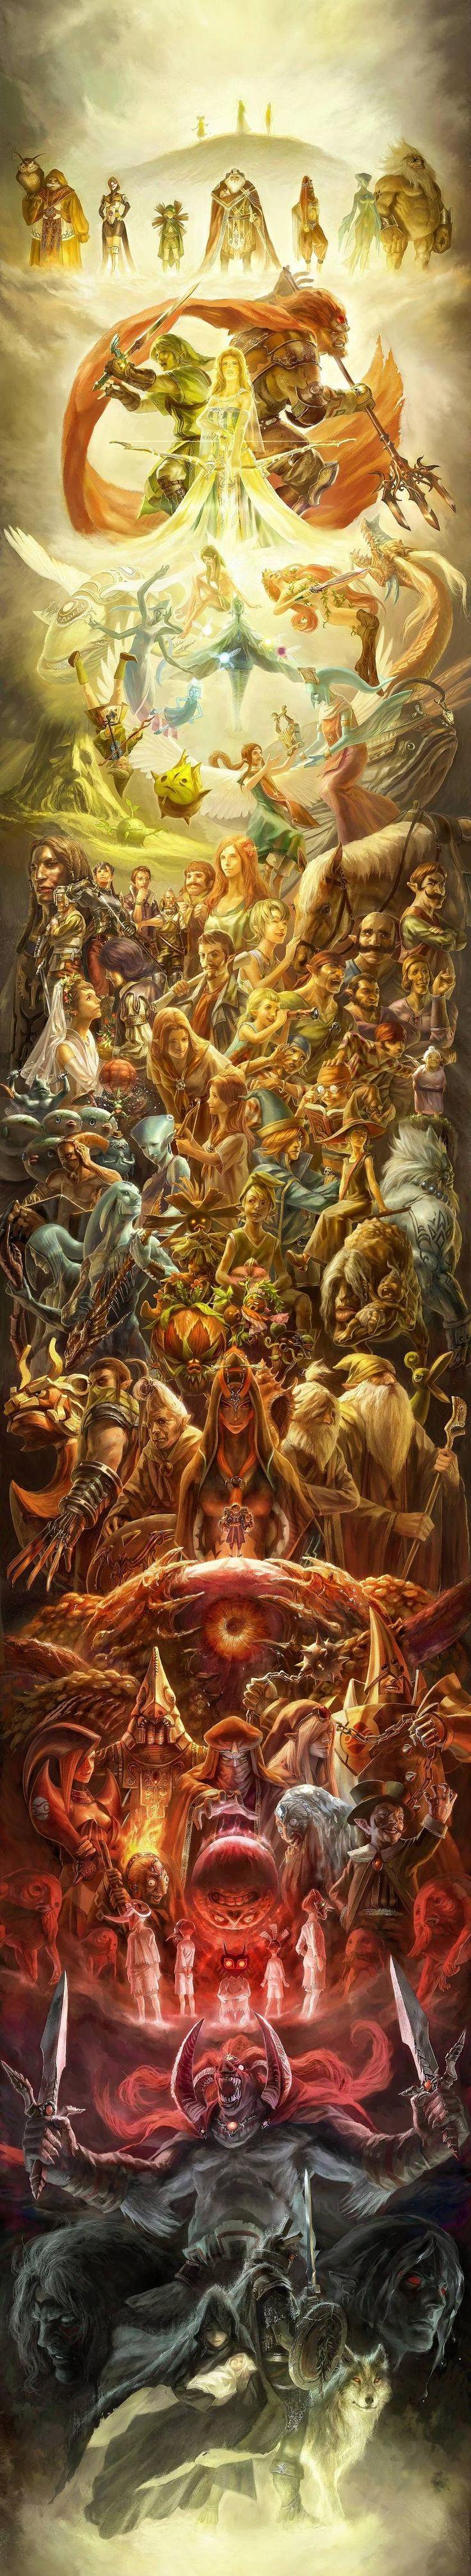 Fan art celebrating the 25th anniversary of the Legend of Zelda